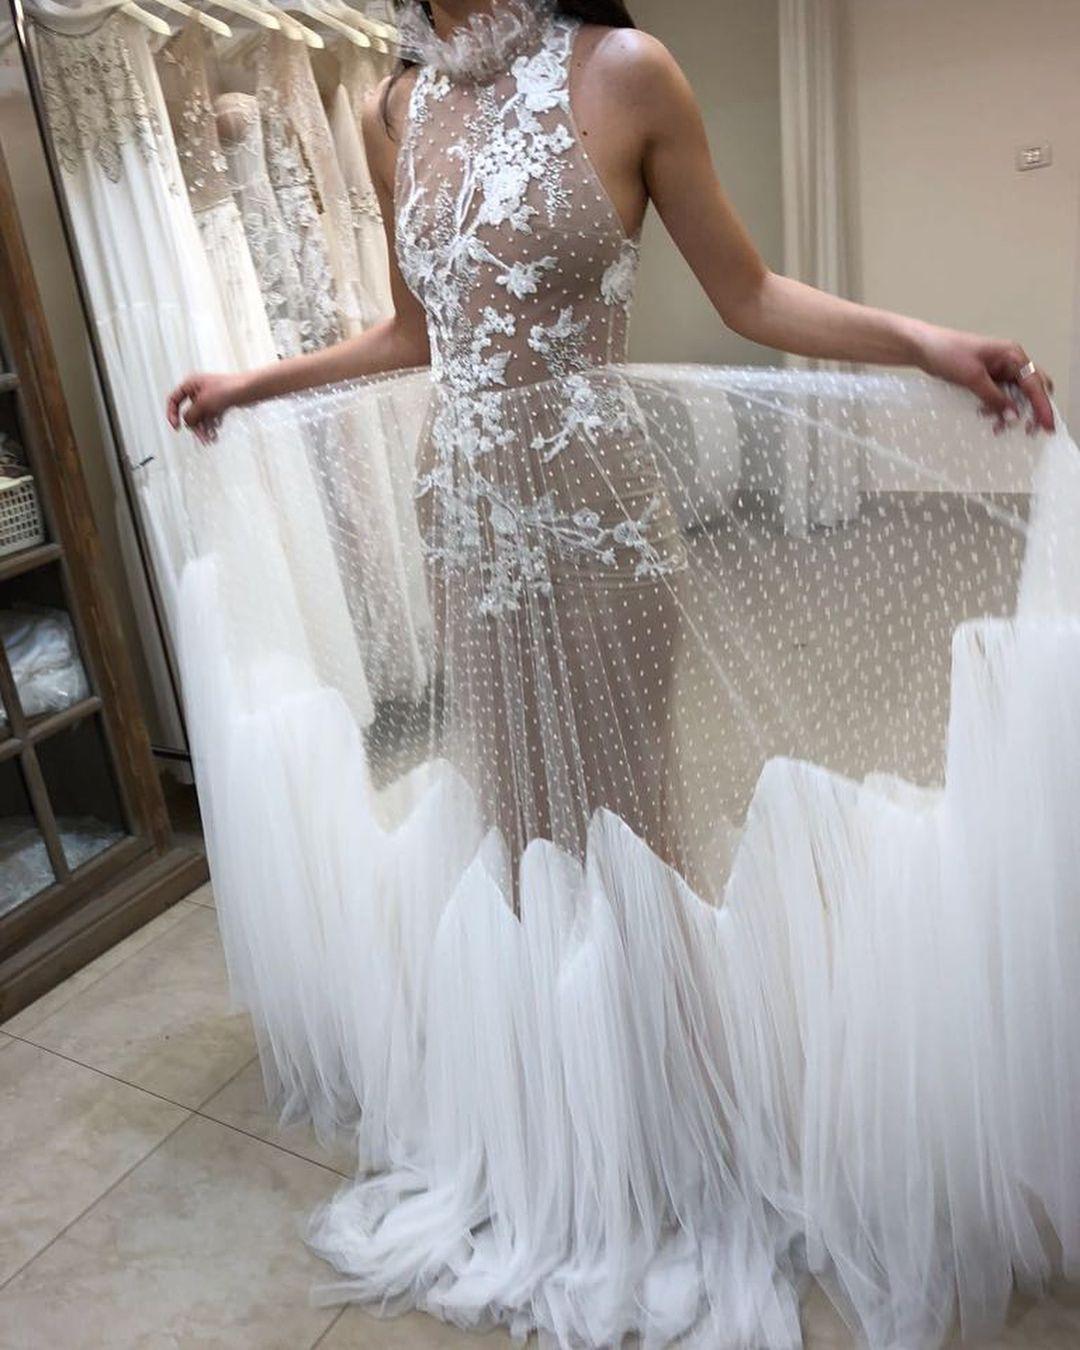 Liz Martinez 2019 Wedding Dresses: Pin By Beyza Berber On Shuffling In 2019